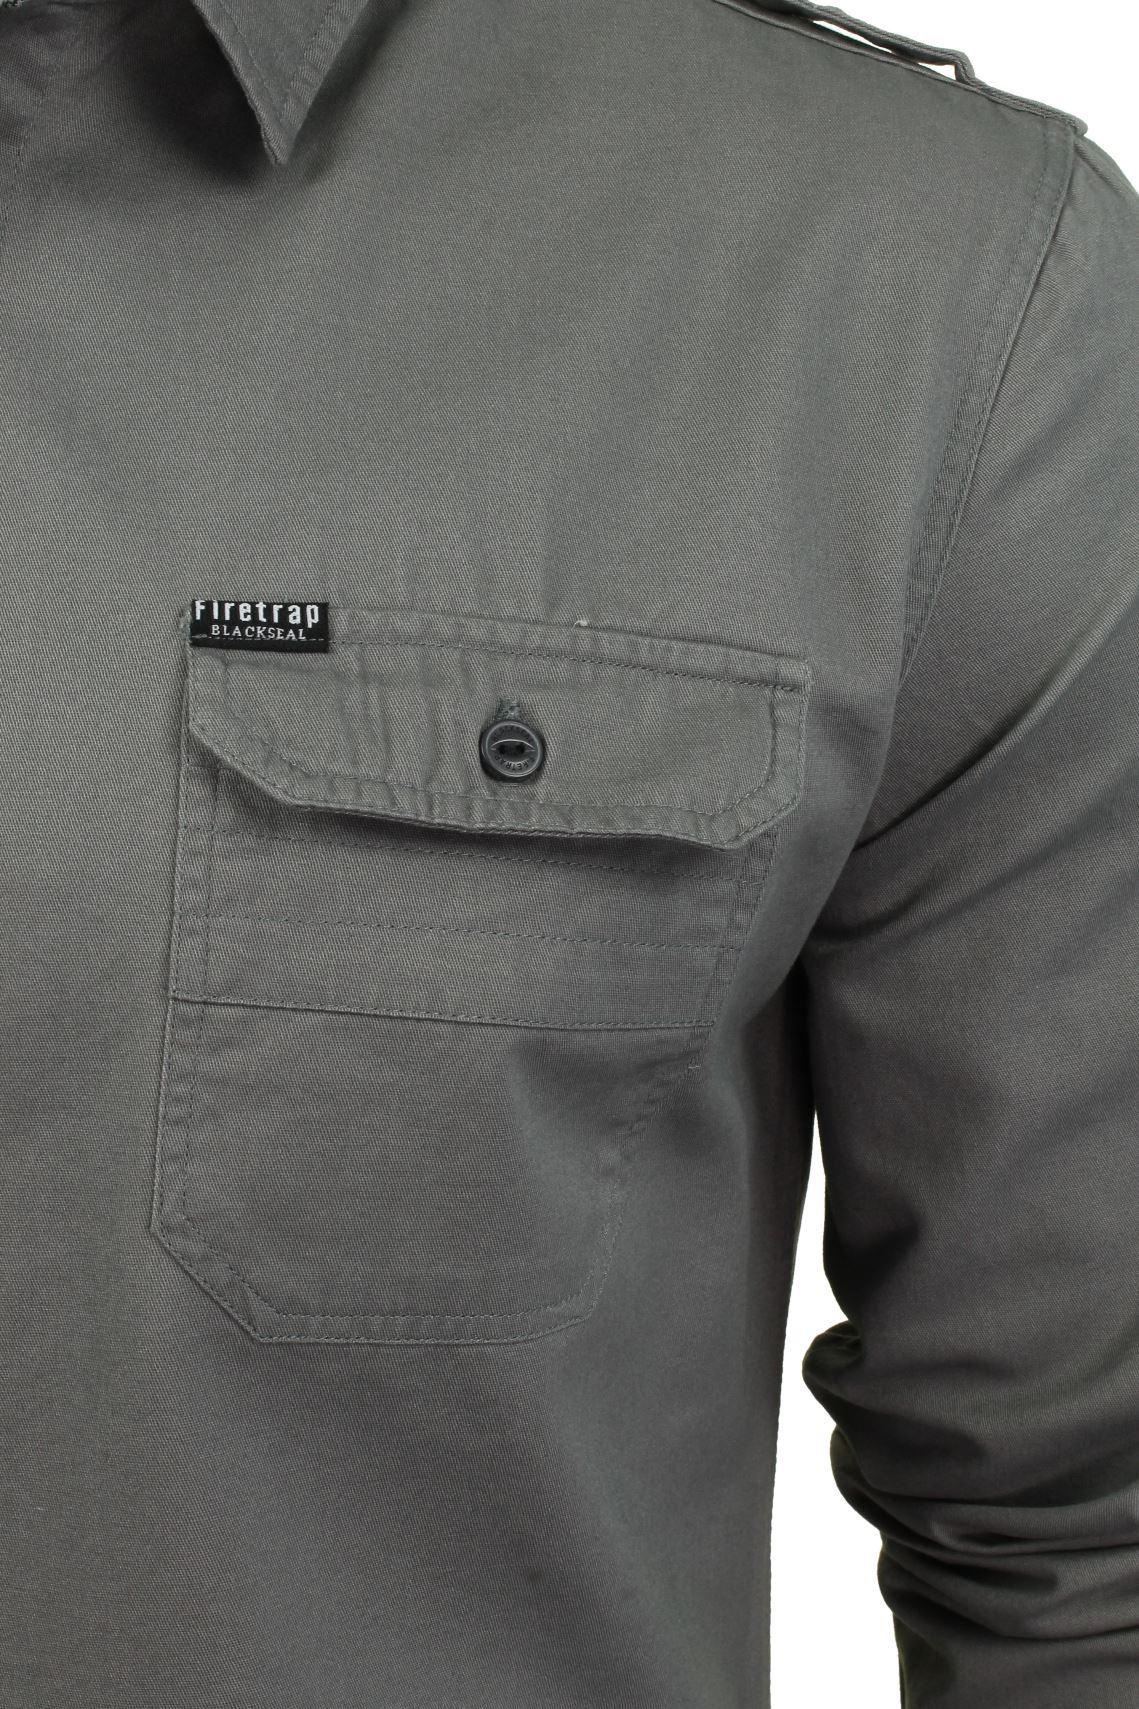 Camisa-para-hombre-por-Firetrap-039-Pittson-039-Manga-Larga miniatura 22